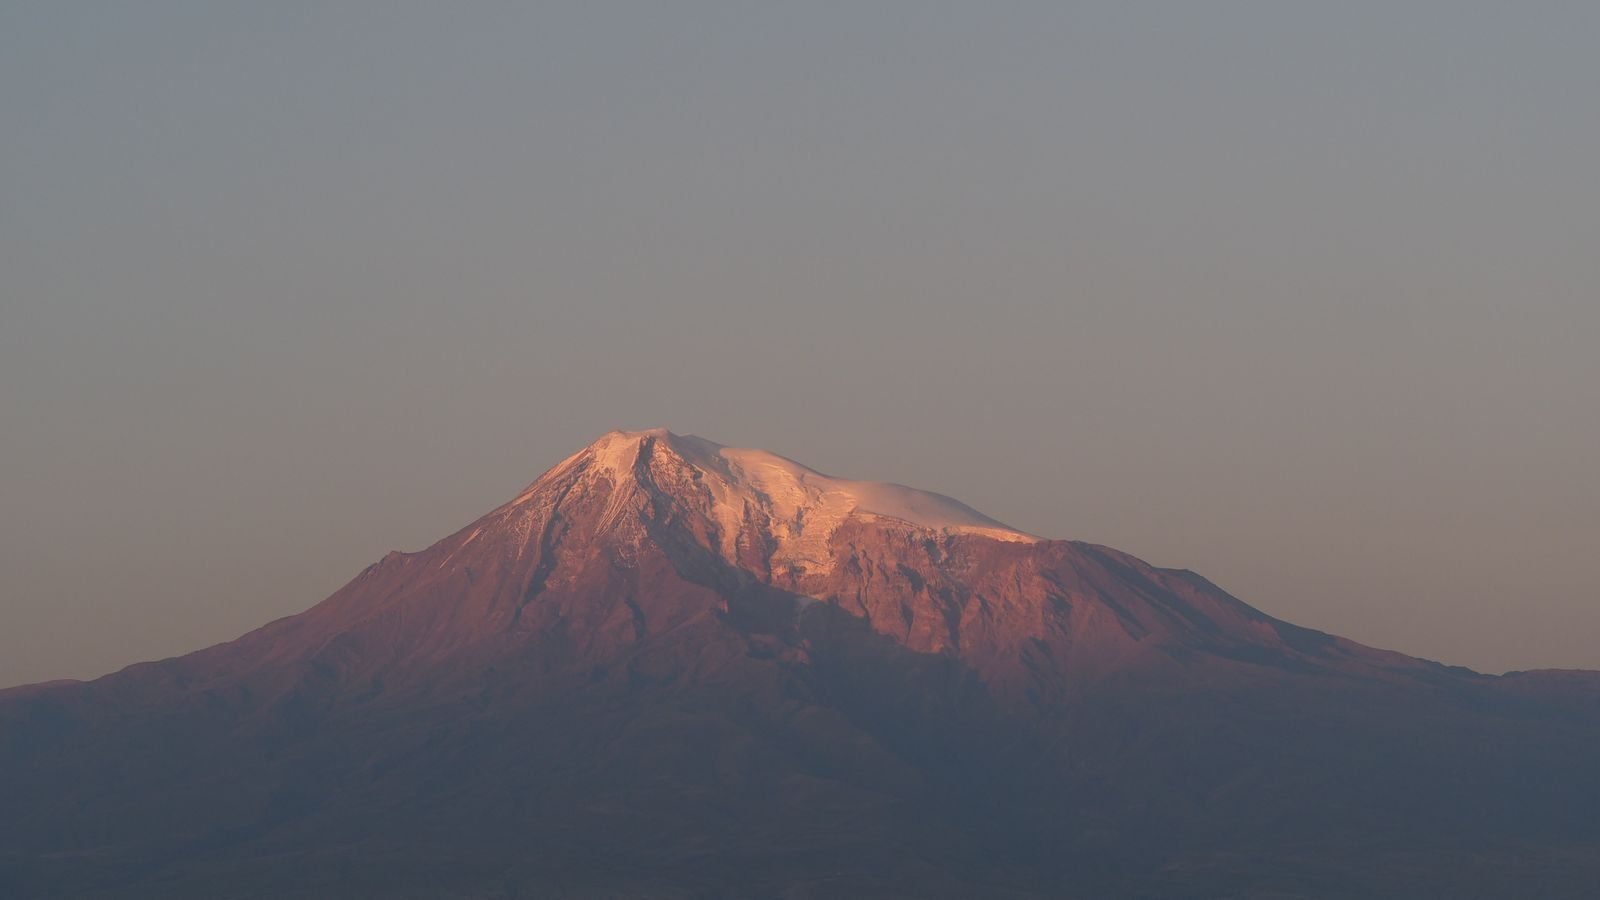 Radreise Armenien - Ararat 5.137 m